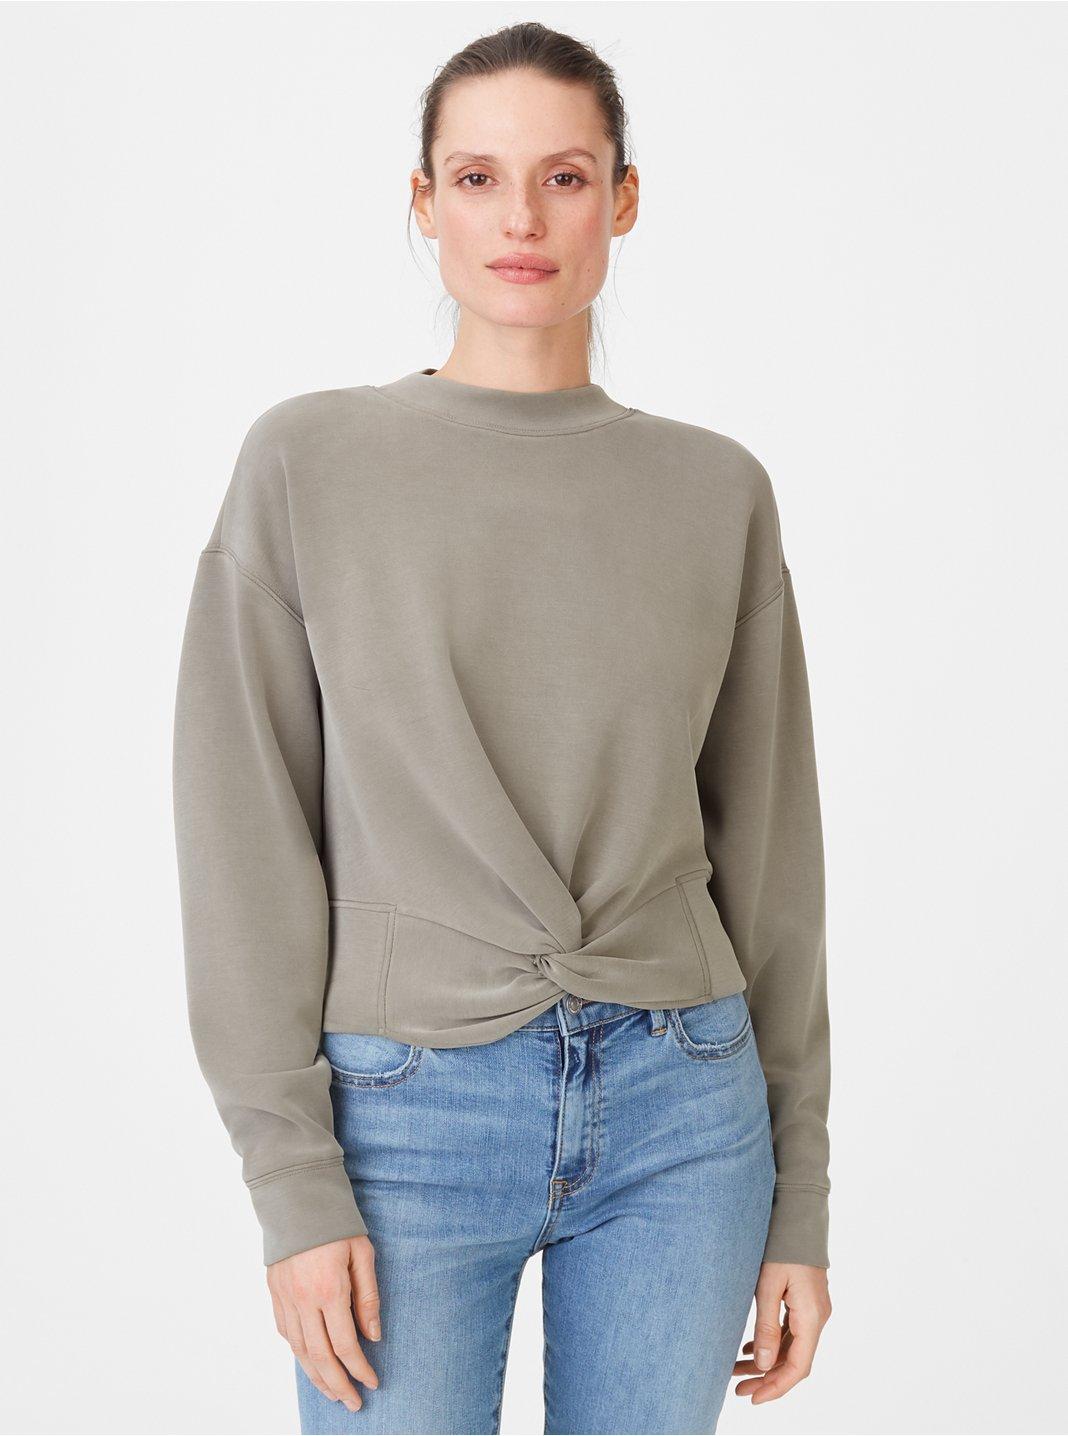 Knottie Sweatshirt